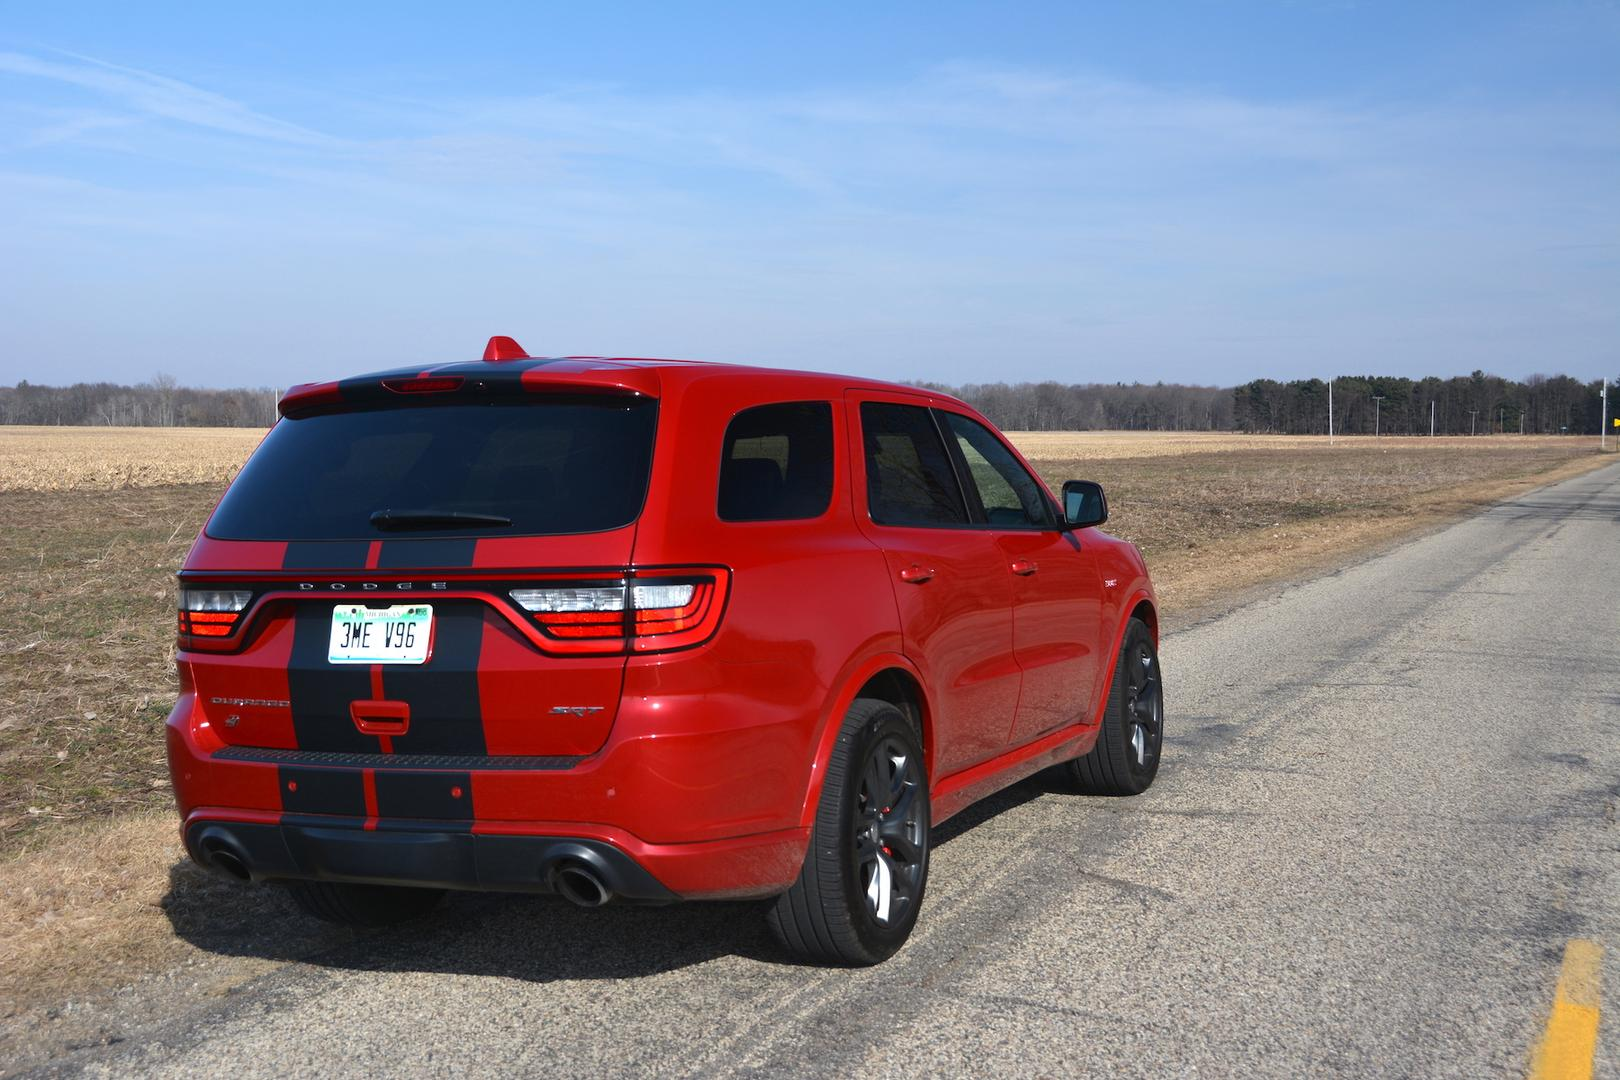 2020 Dodge Durango SRT 392 Specs